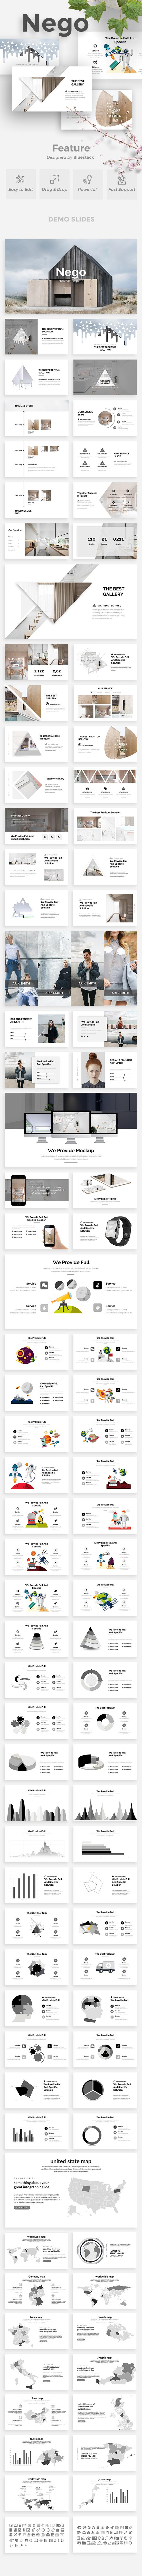 Nego Creative Google Slide Template - Google Slides Presentation Templates